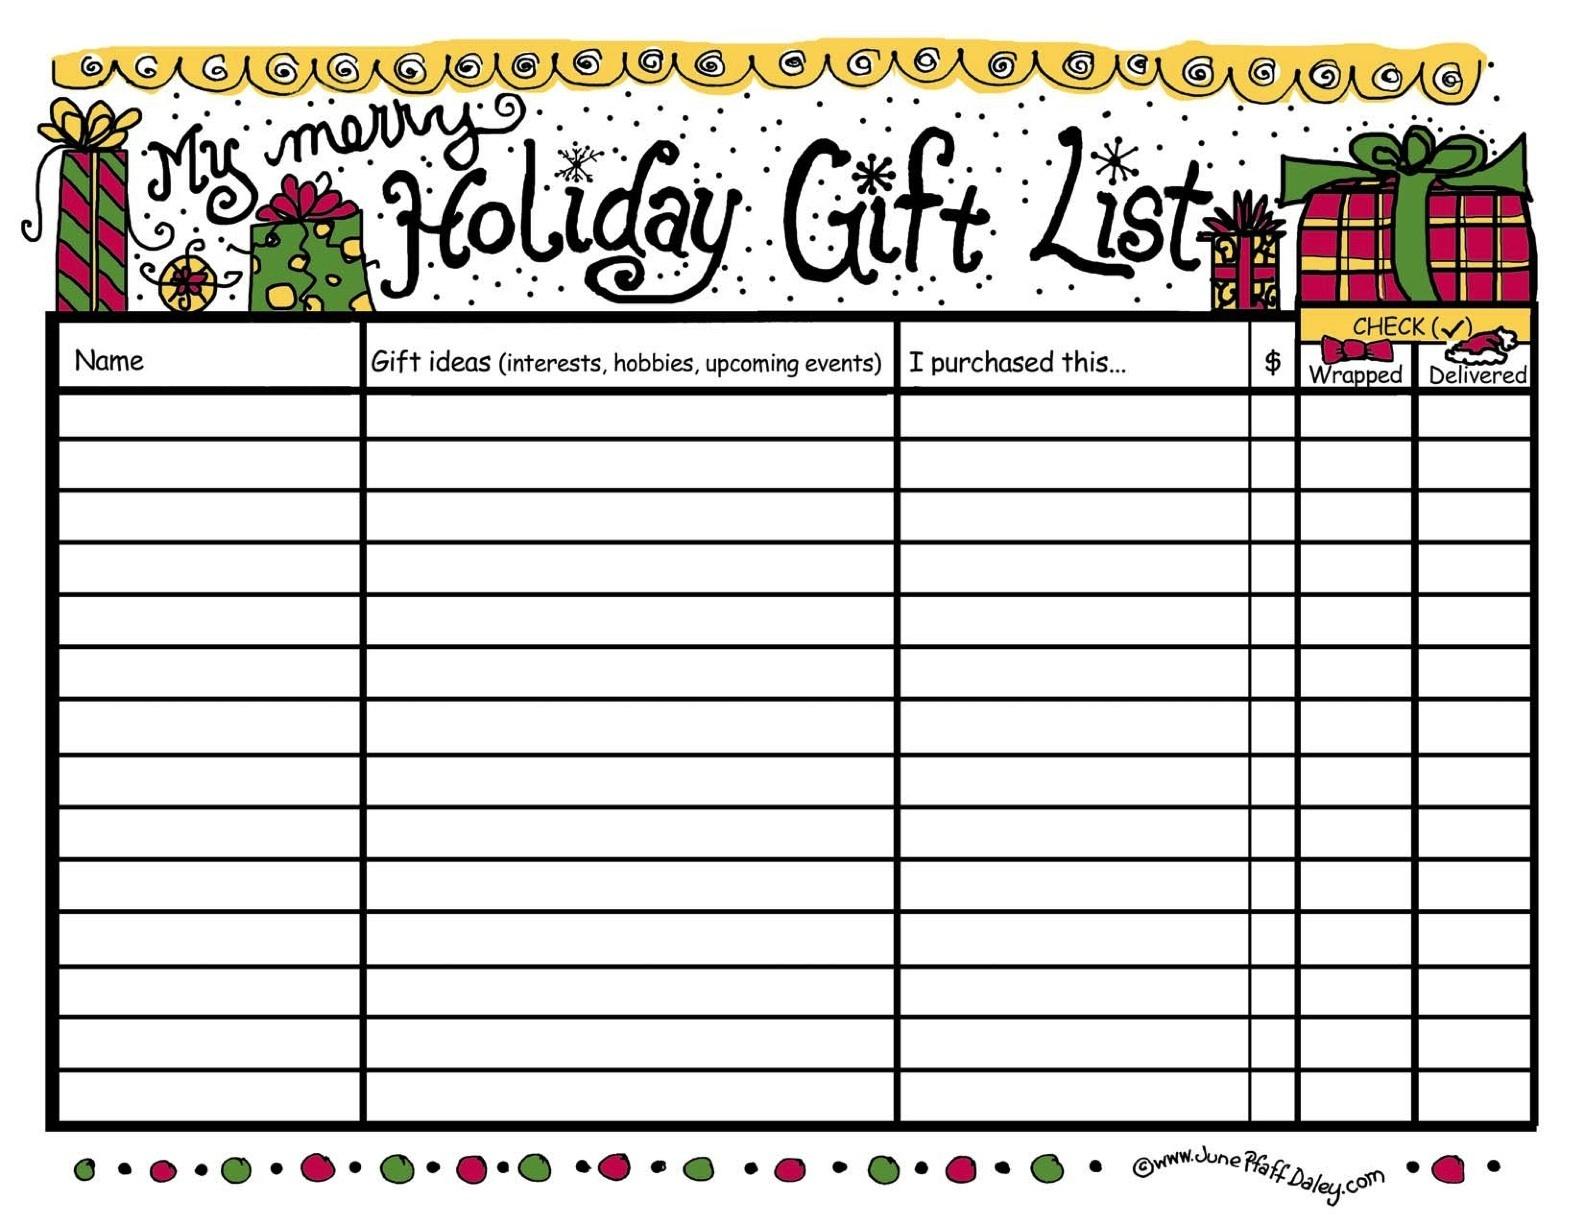 Christmas List Maker Printable - Home Design Ideas - Home Design Ideas - Free Printable Christmas List Maker